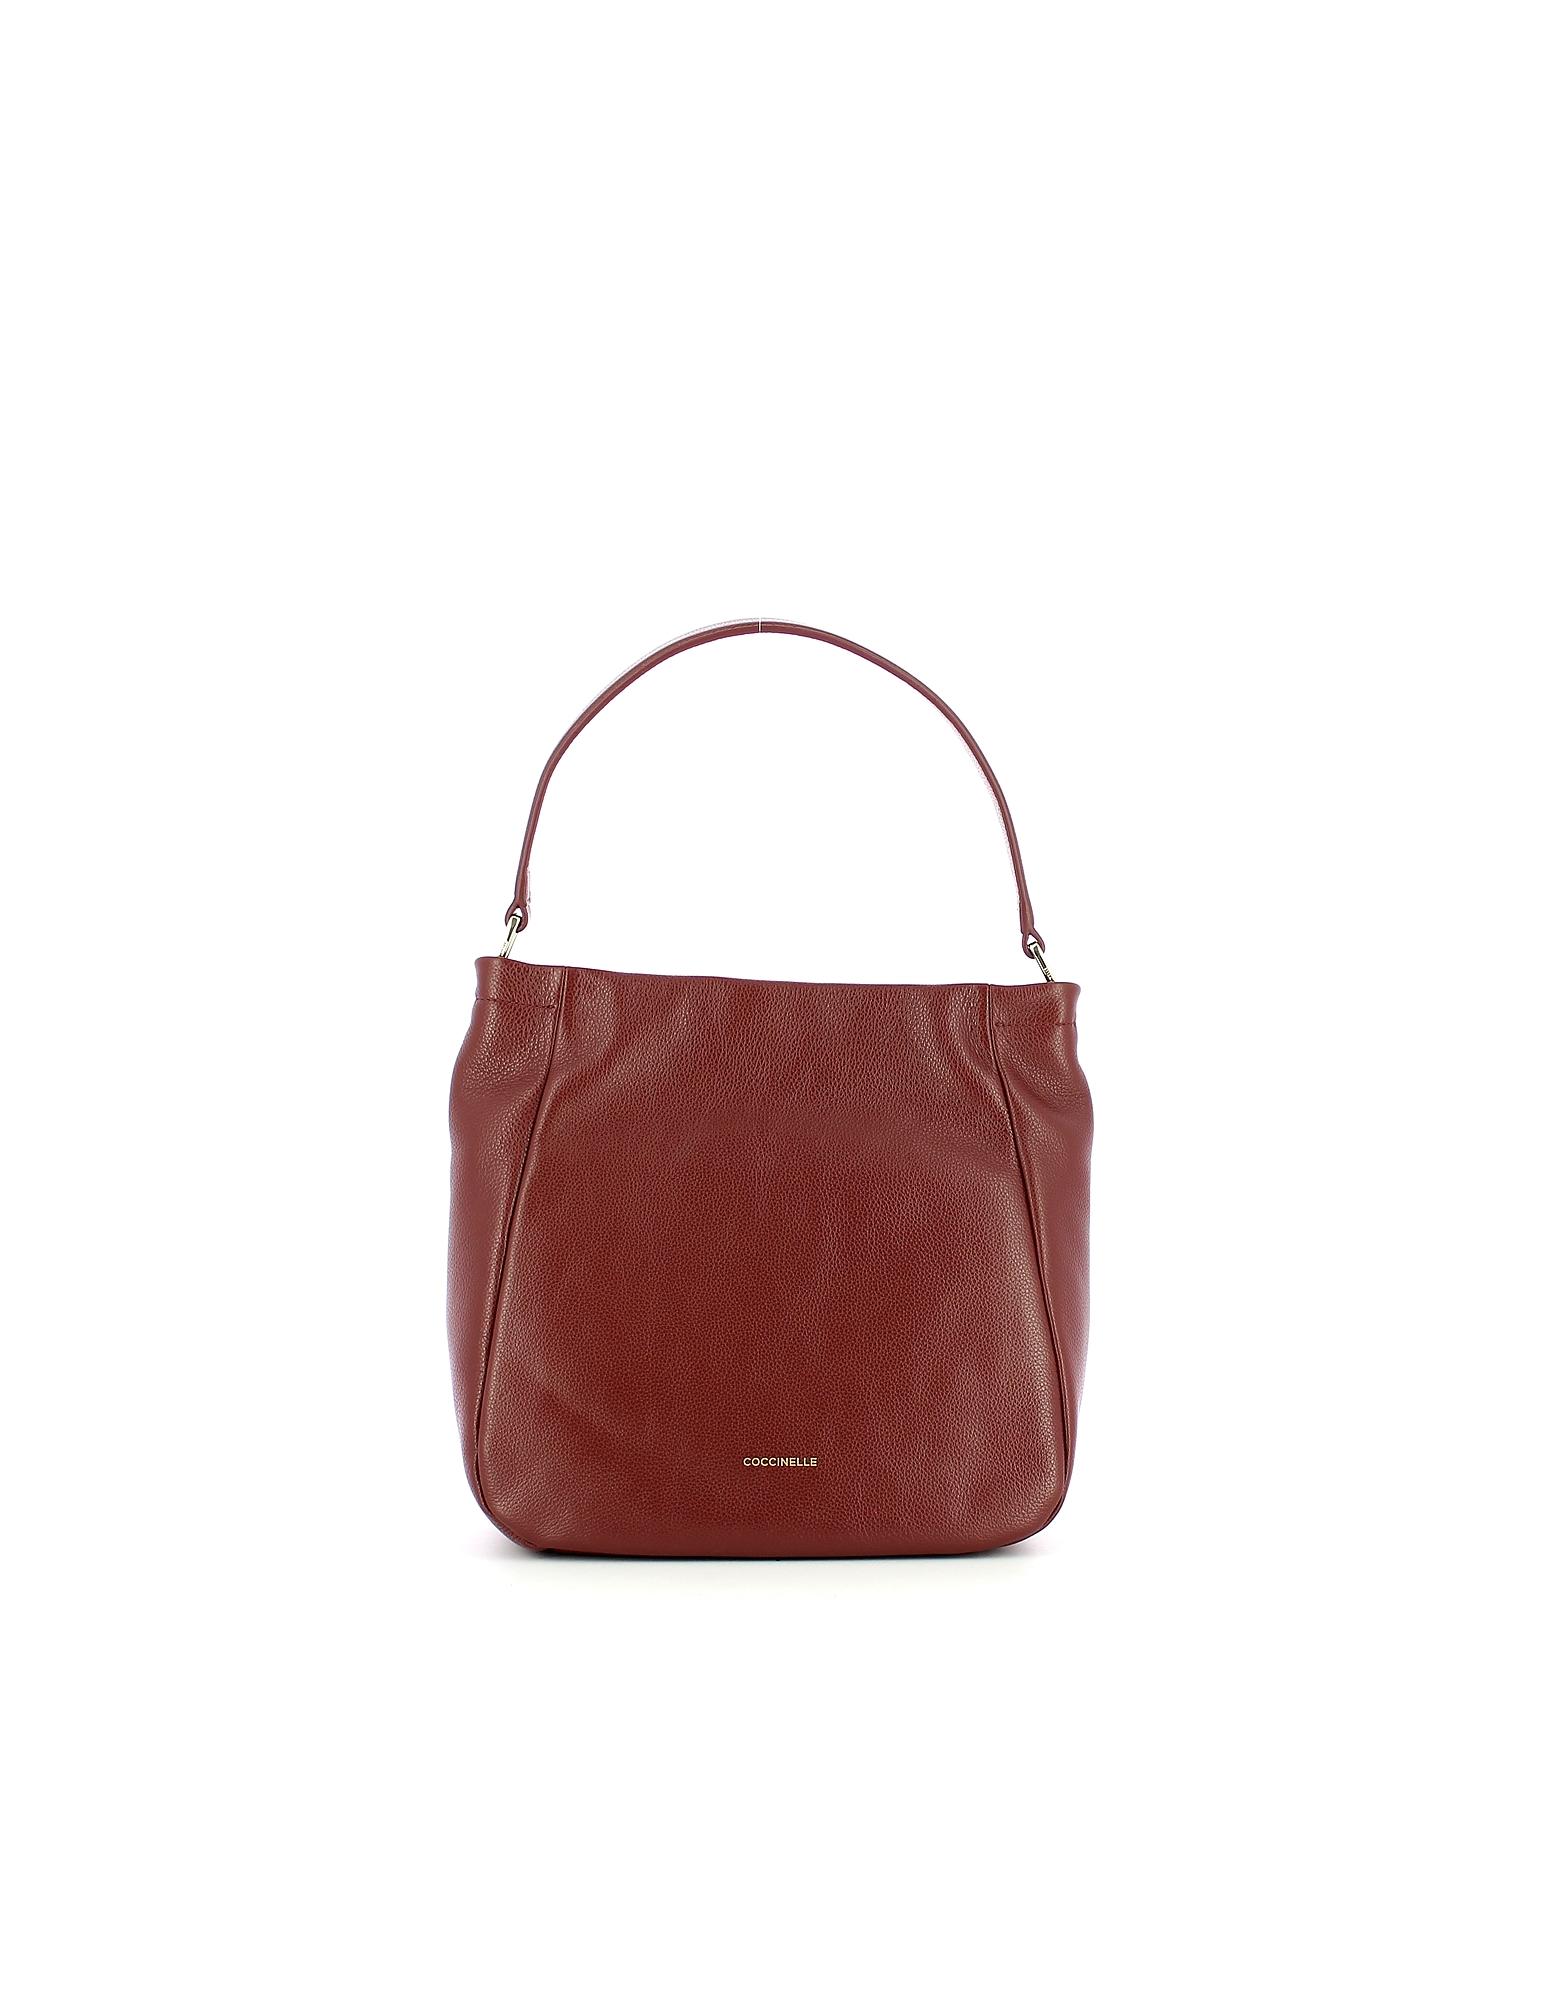 Coccinelle Designer Handbags, Dark Red Rendez-Vous Hobo Bag